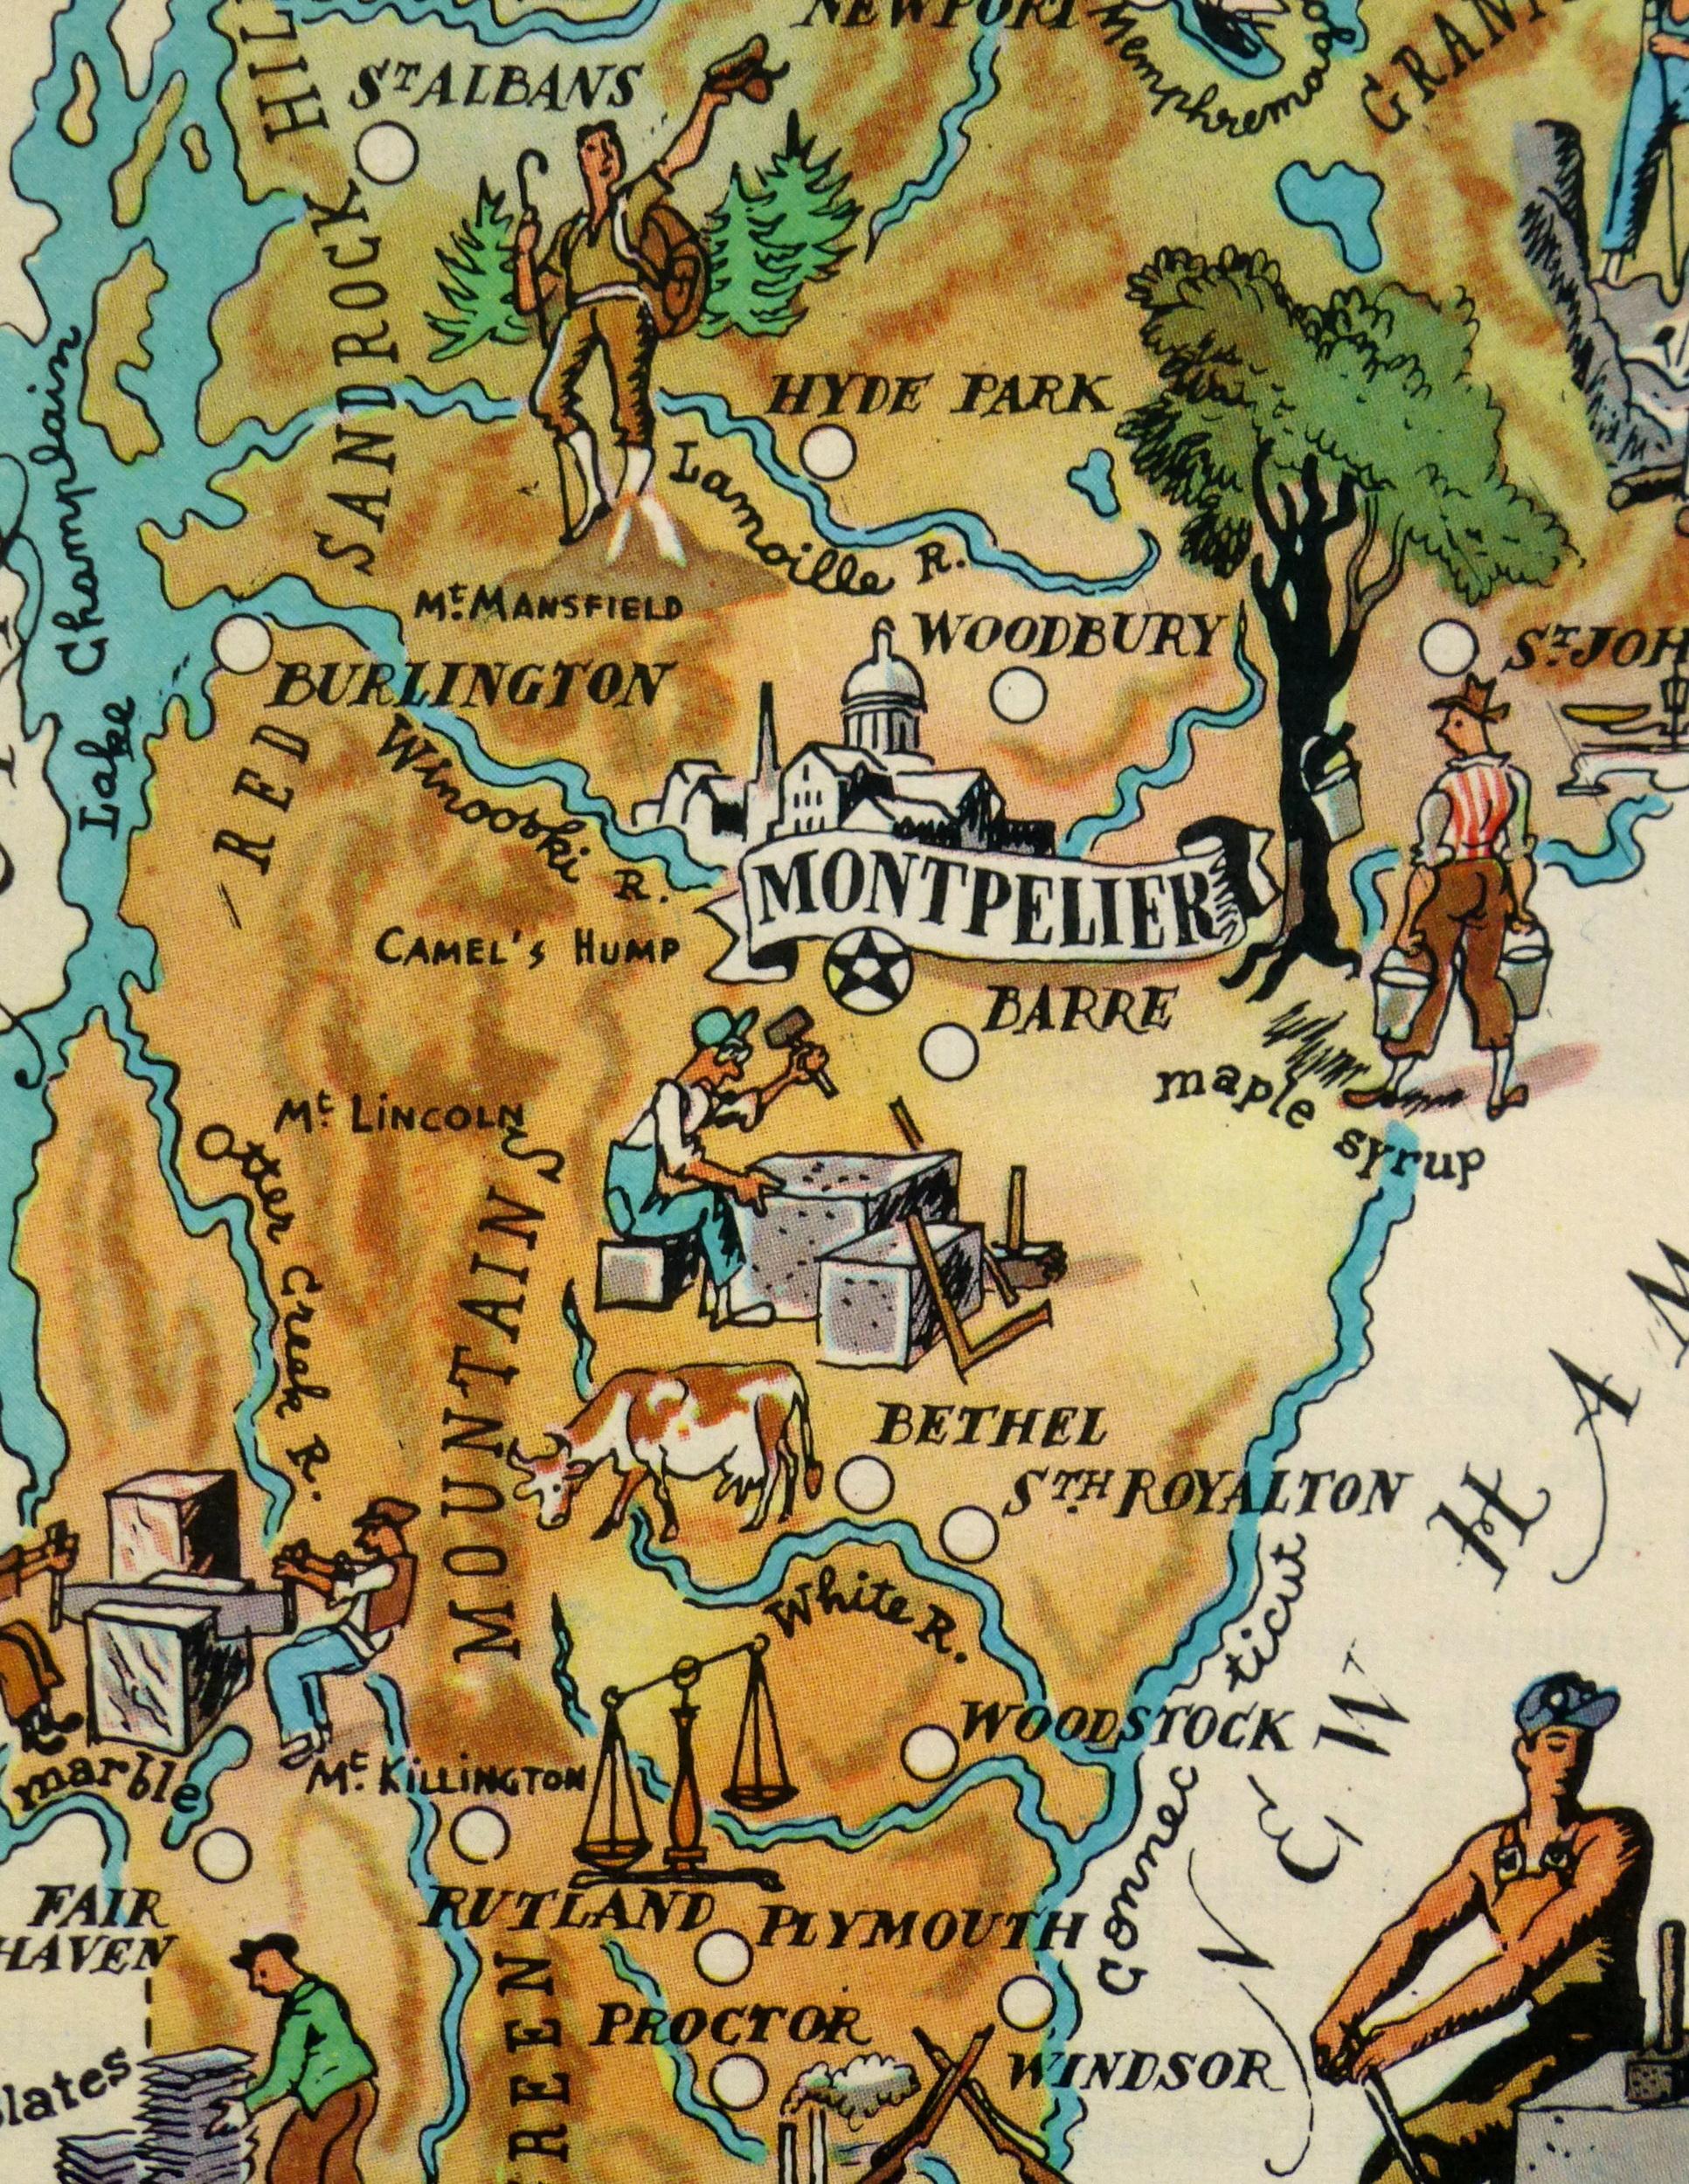 Vermont Pictorial Map, 1946-detail-6232K